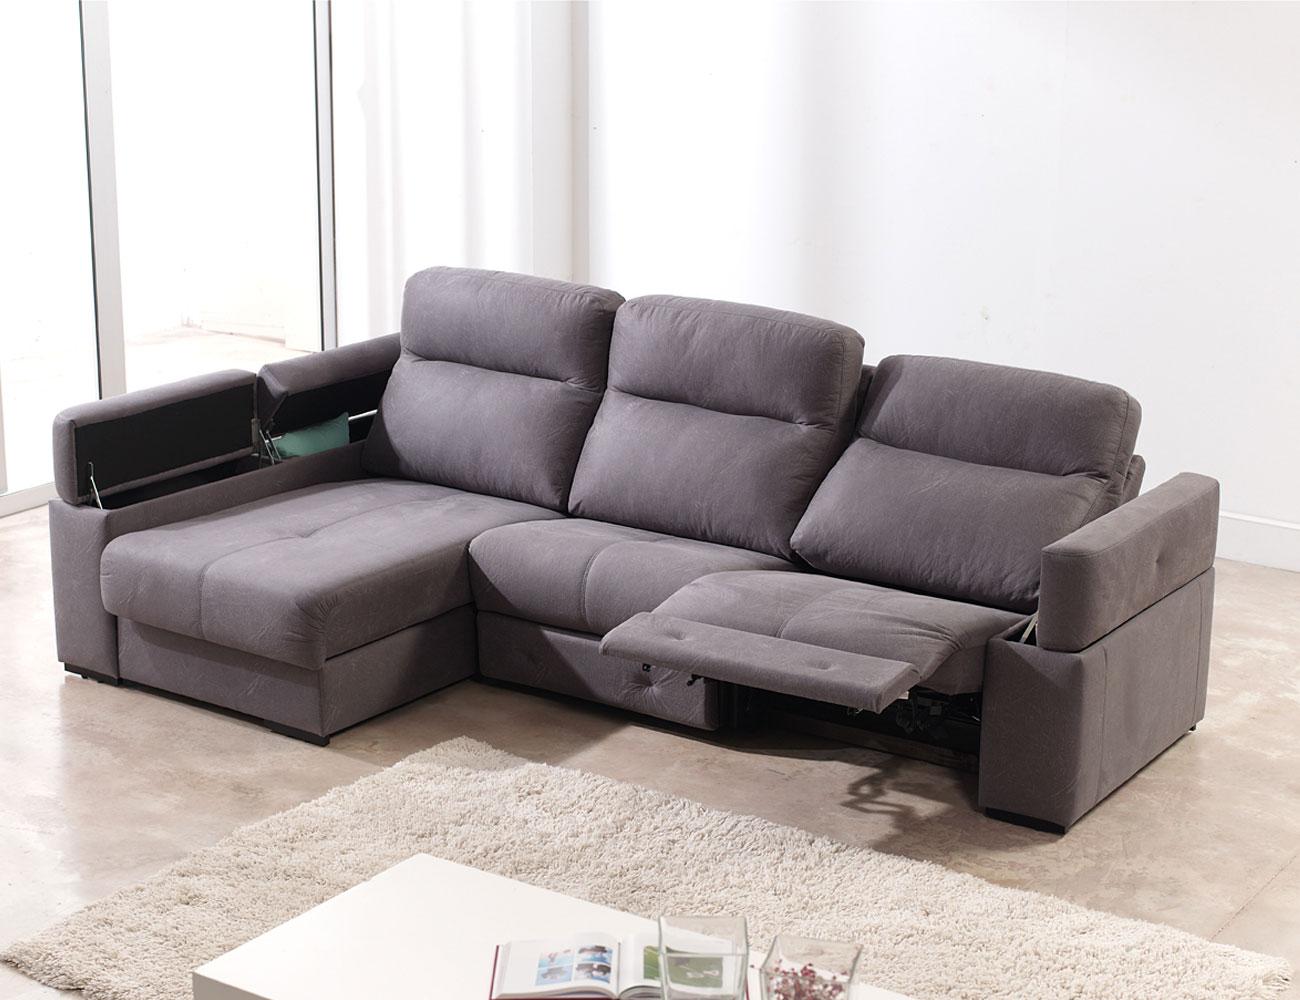 Sofa chaiselongue relax motor electrico 3 arcon 114